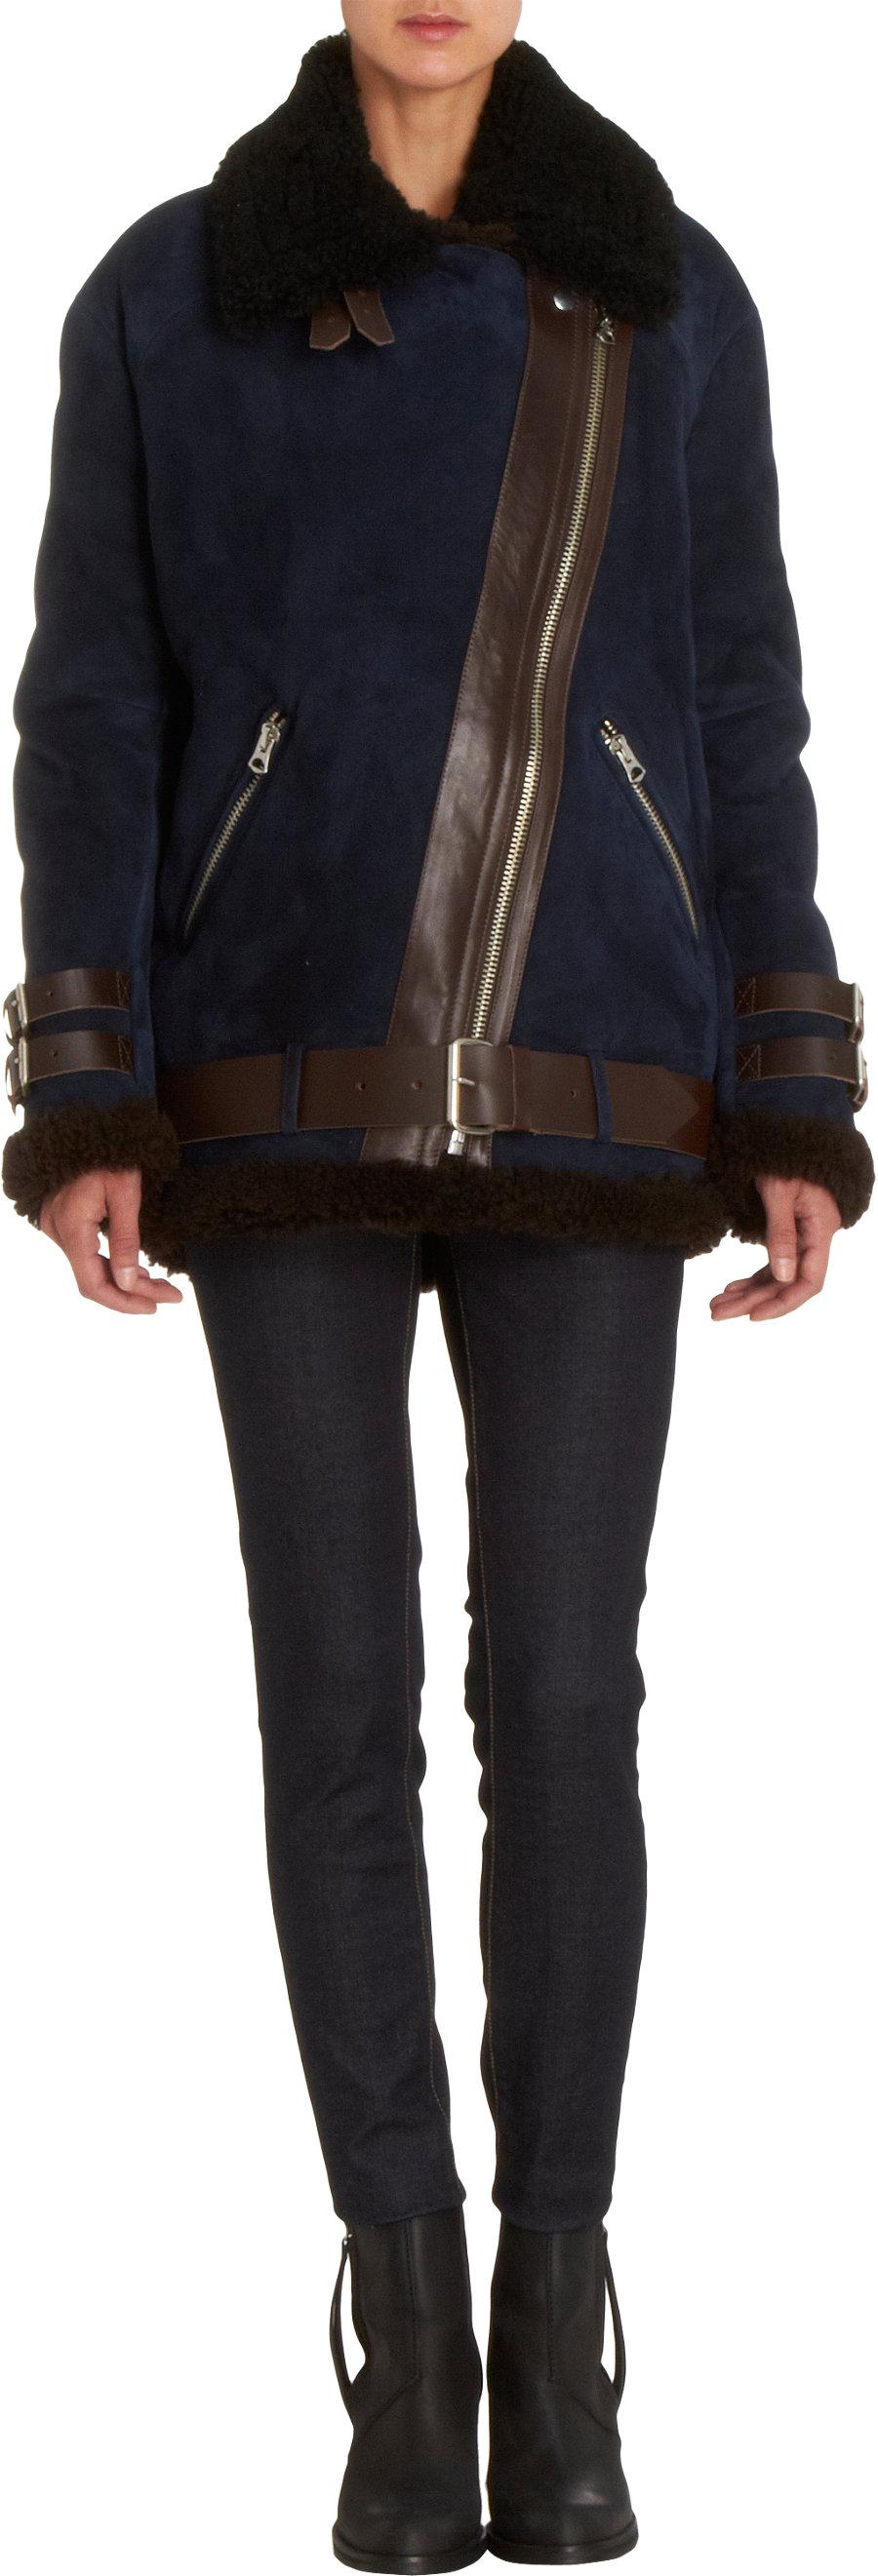 Acne Studios Oversized Moto Jacket at Barneys.com